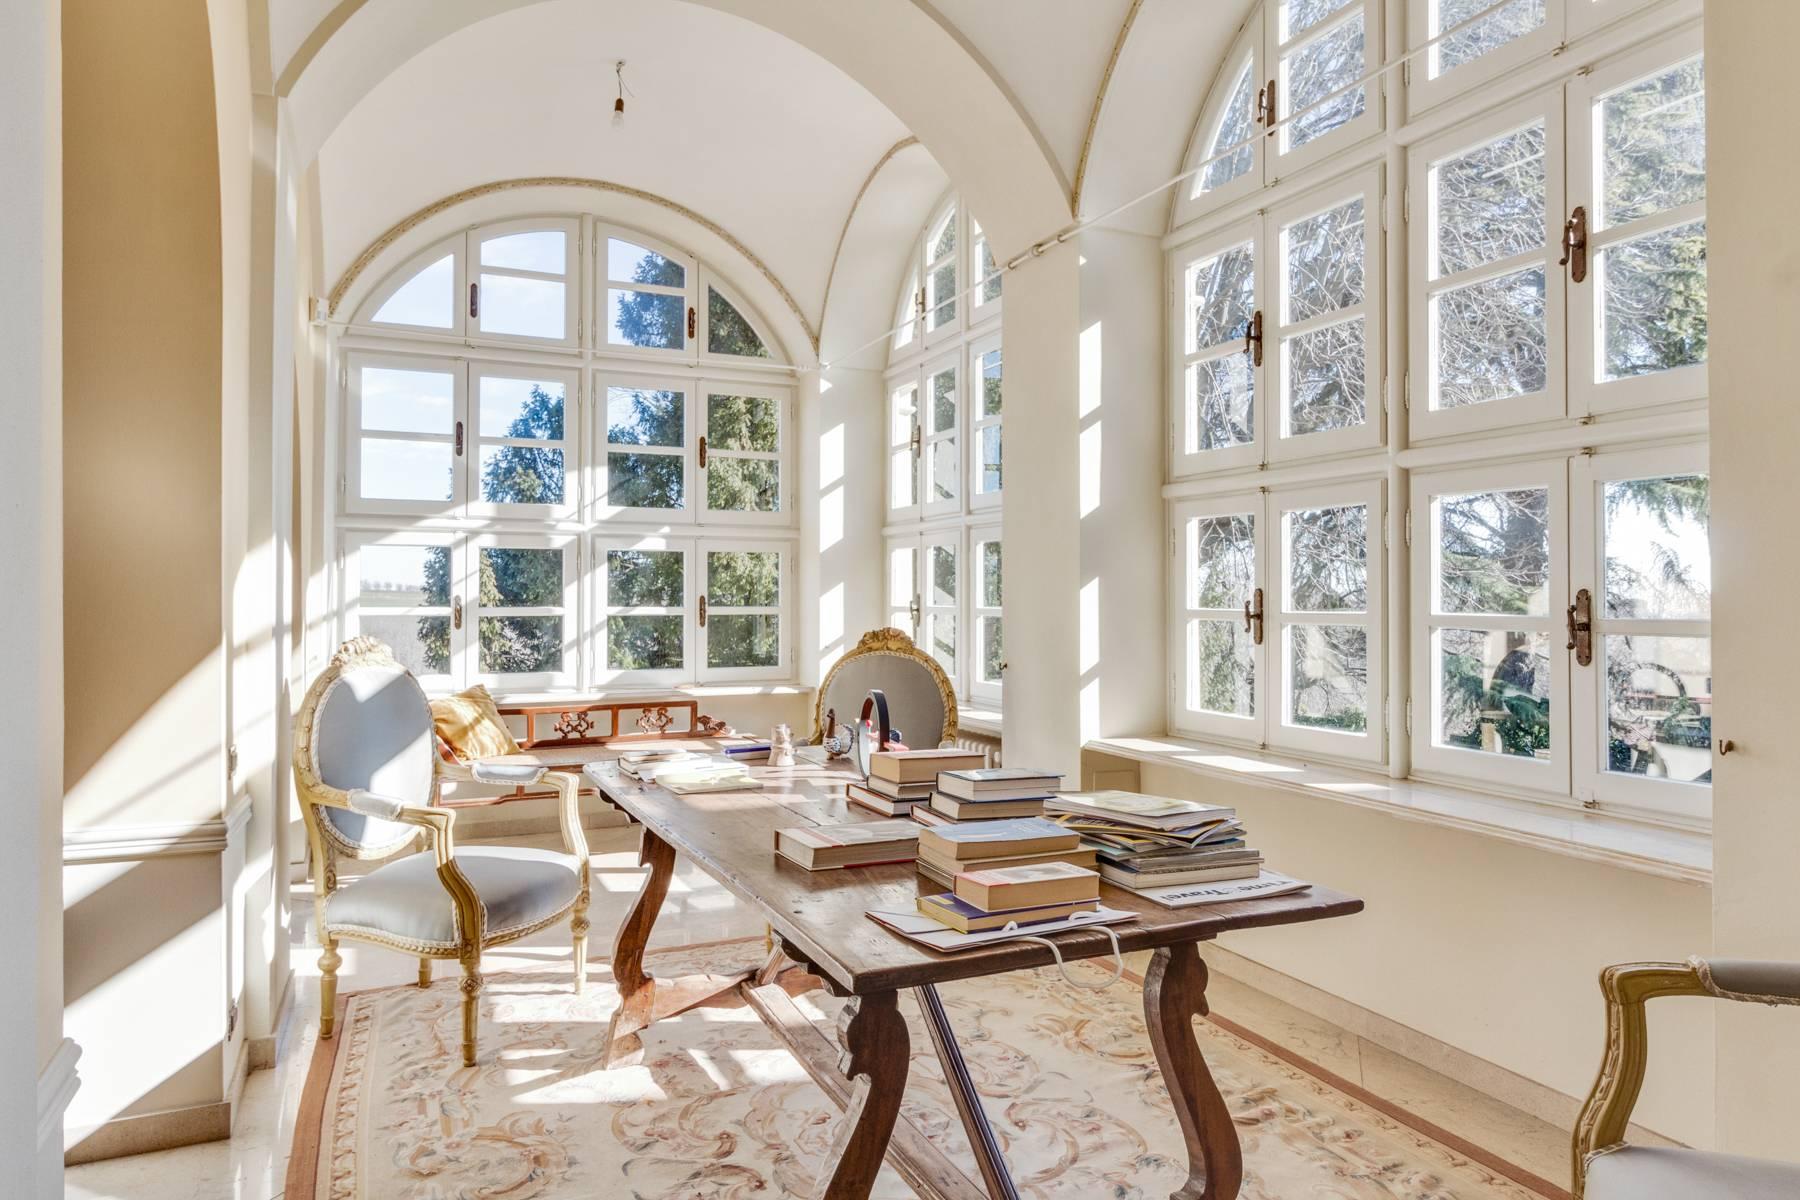 Villa in Vendita a Pino Torinese: 5 locali, 2087 mq - Foto 5